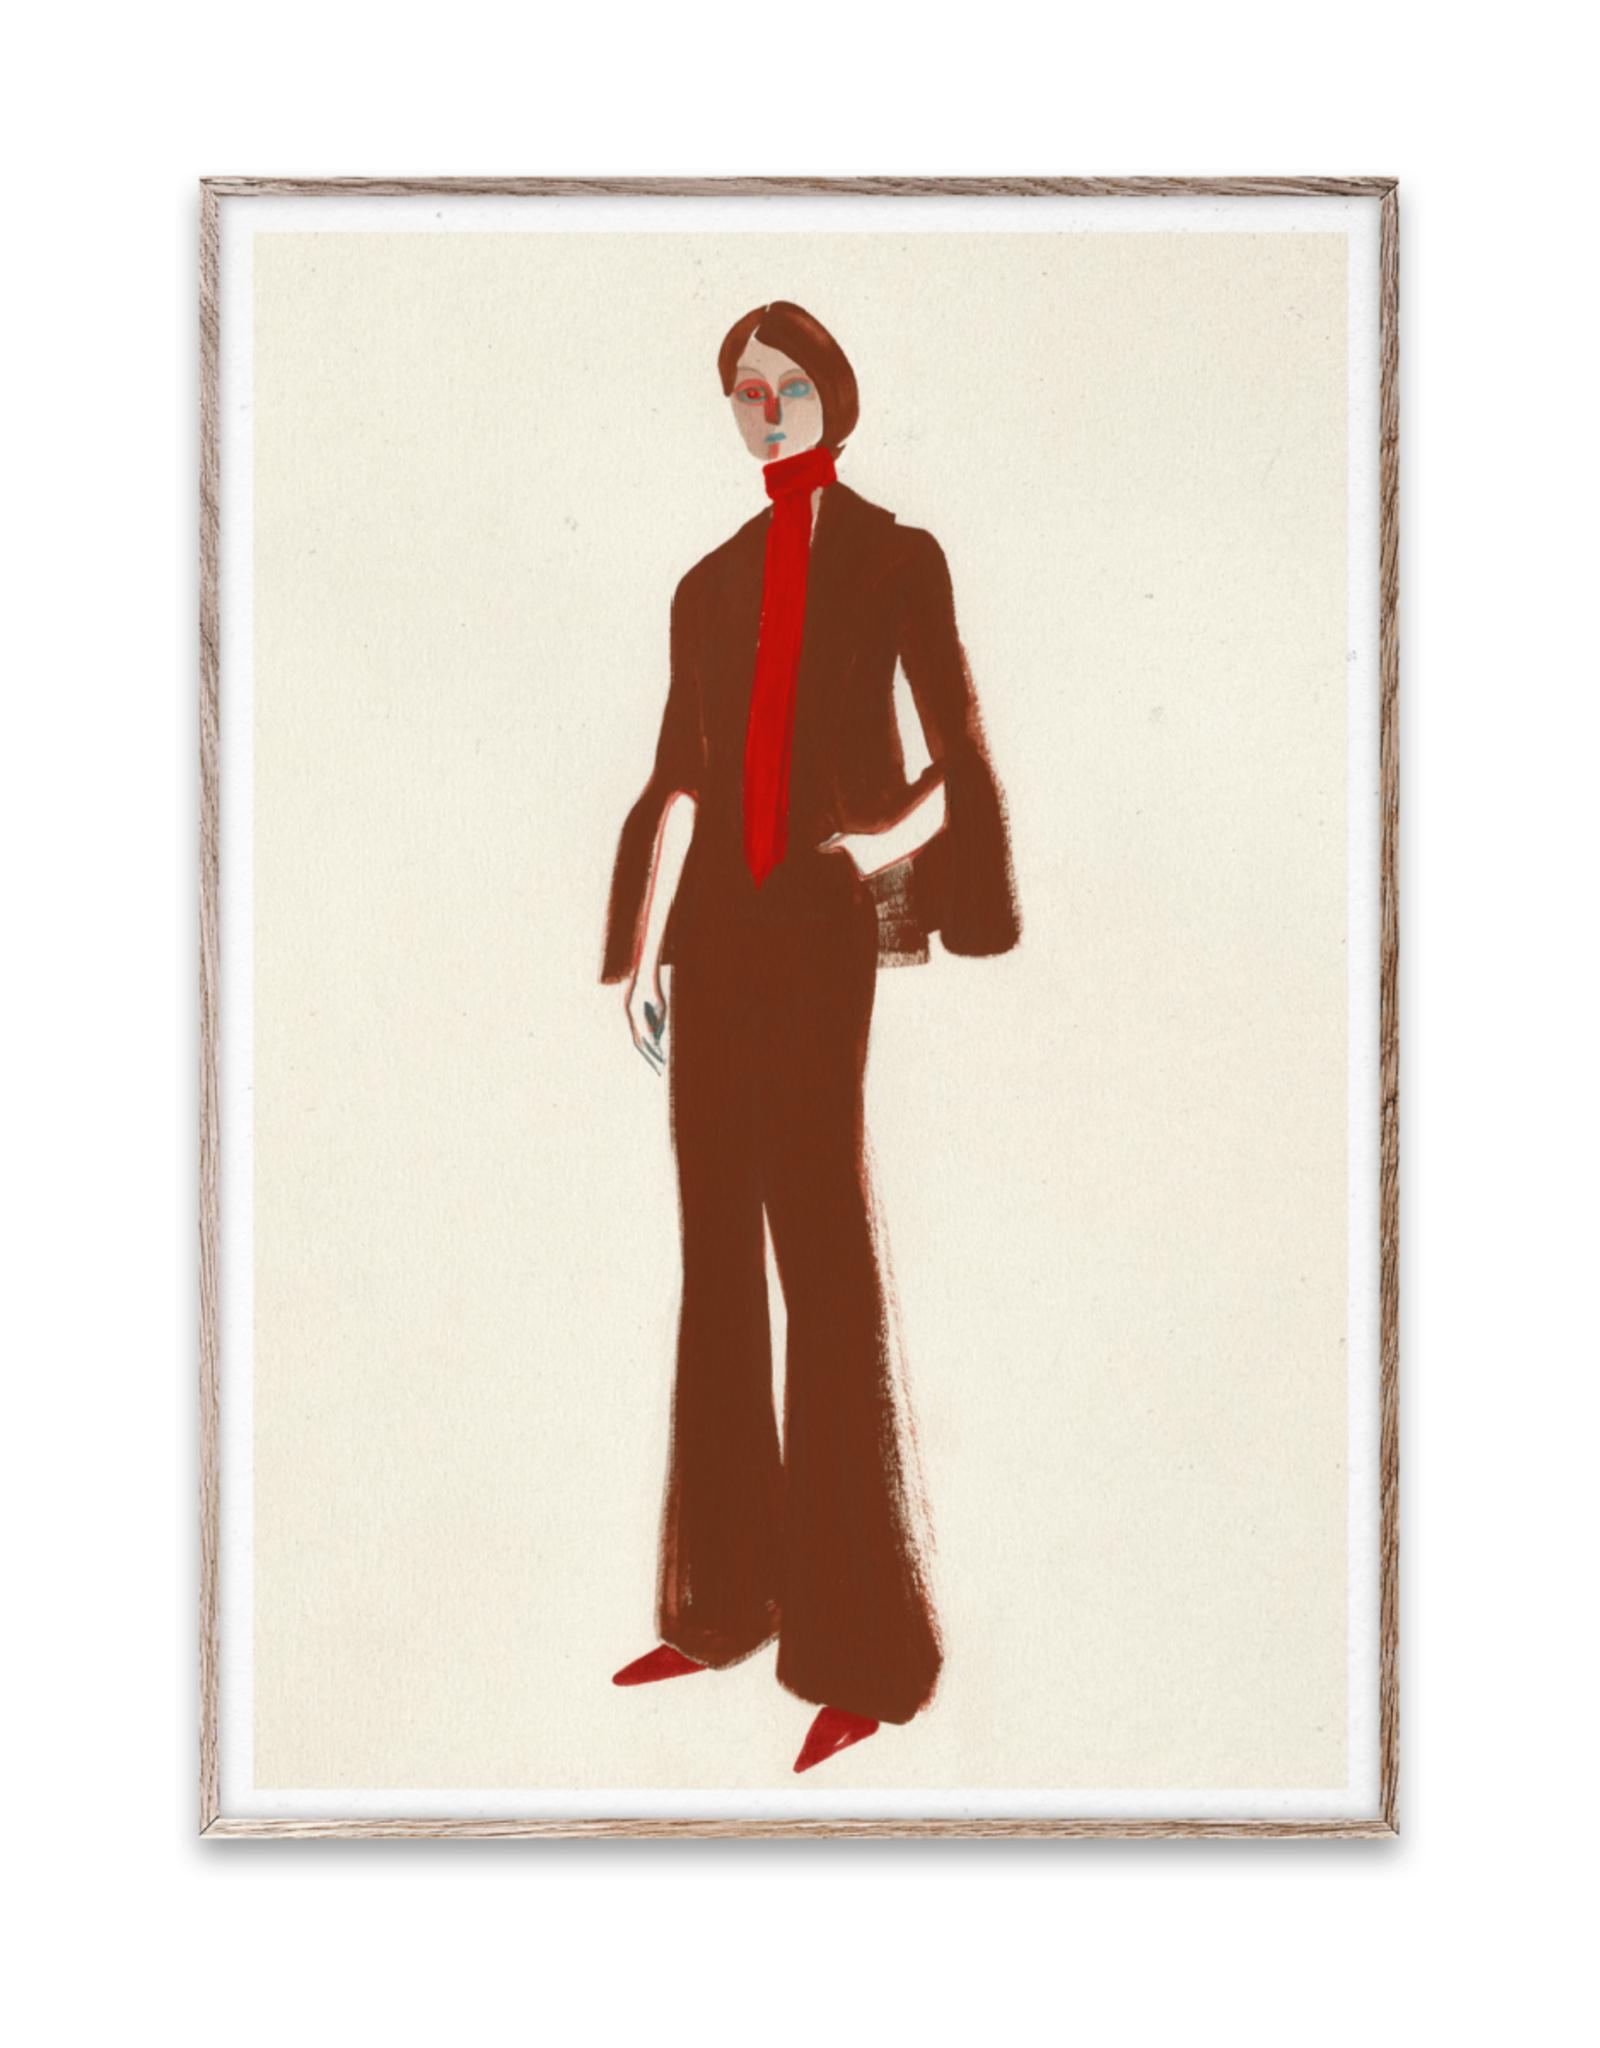 "Paper Collective ""The Suit"" by Amelie Hergardt 30x40cm"